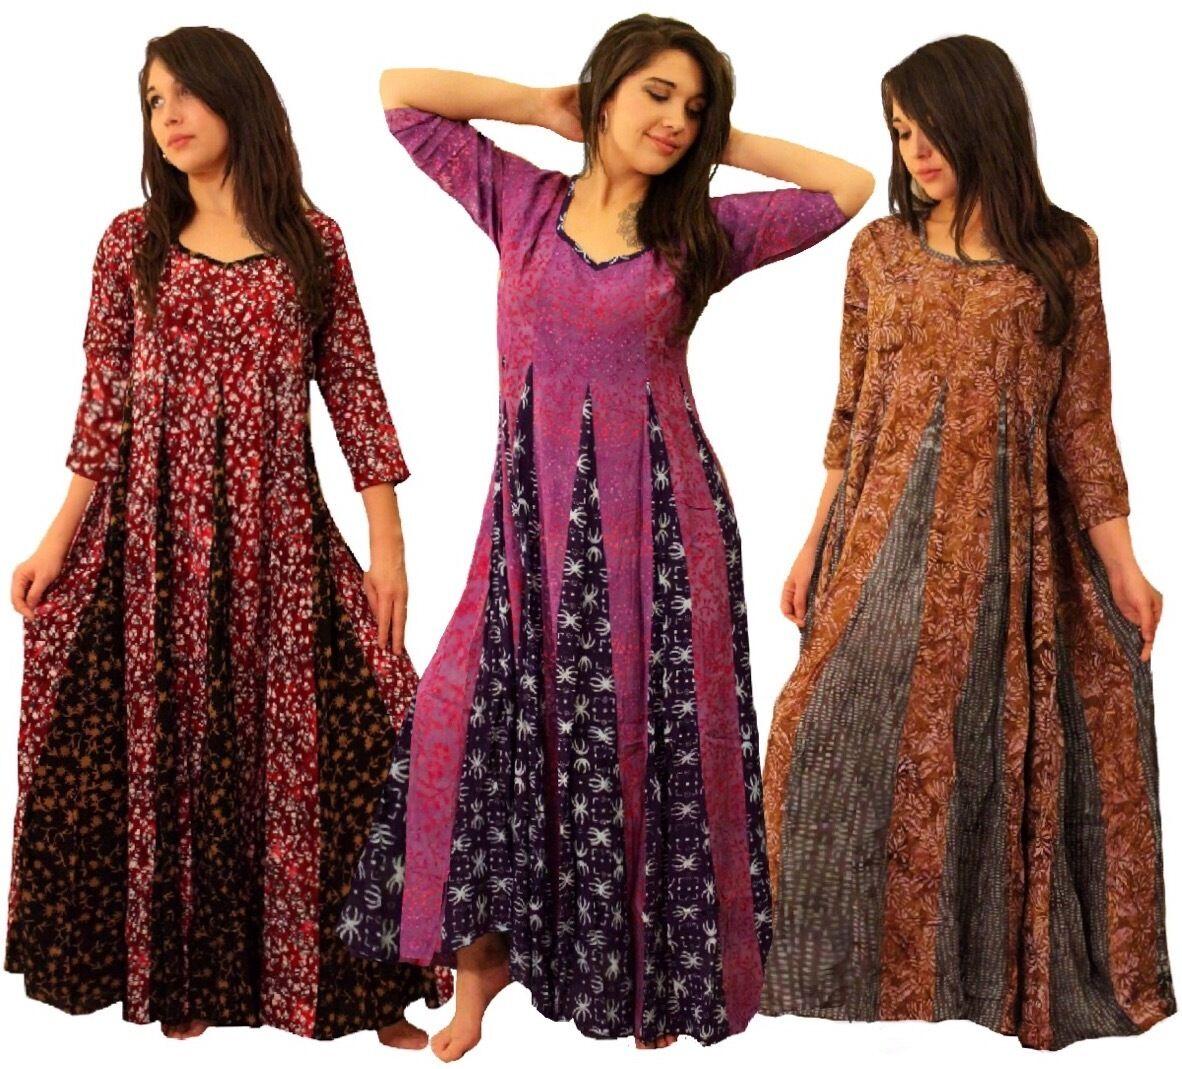 Boho Inset Dress - 3 4 Sleeve Gauzy Batik -Triangle LotusTraders U580 Plus Sizes